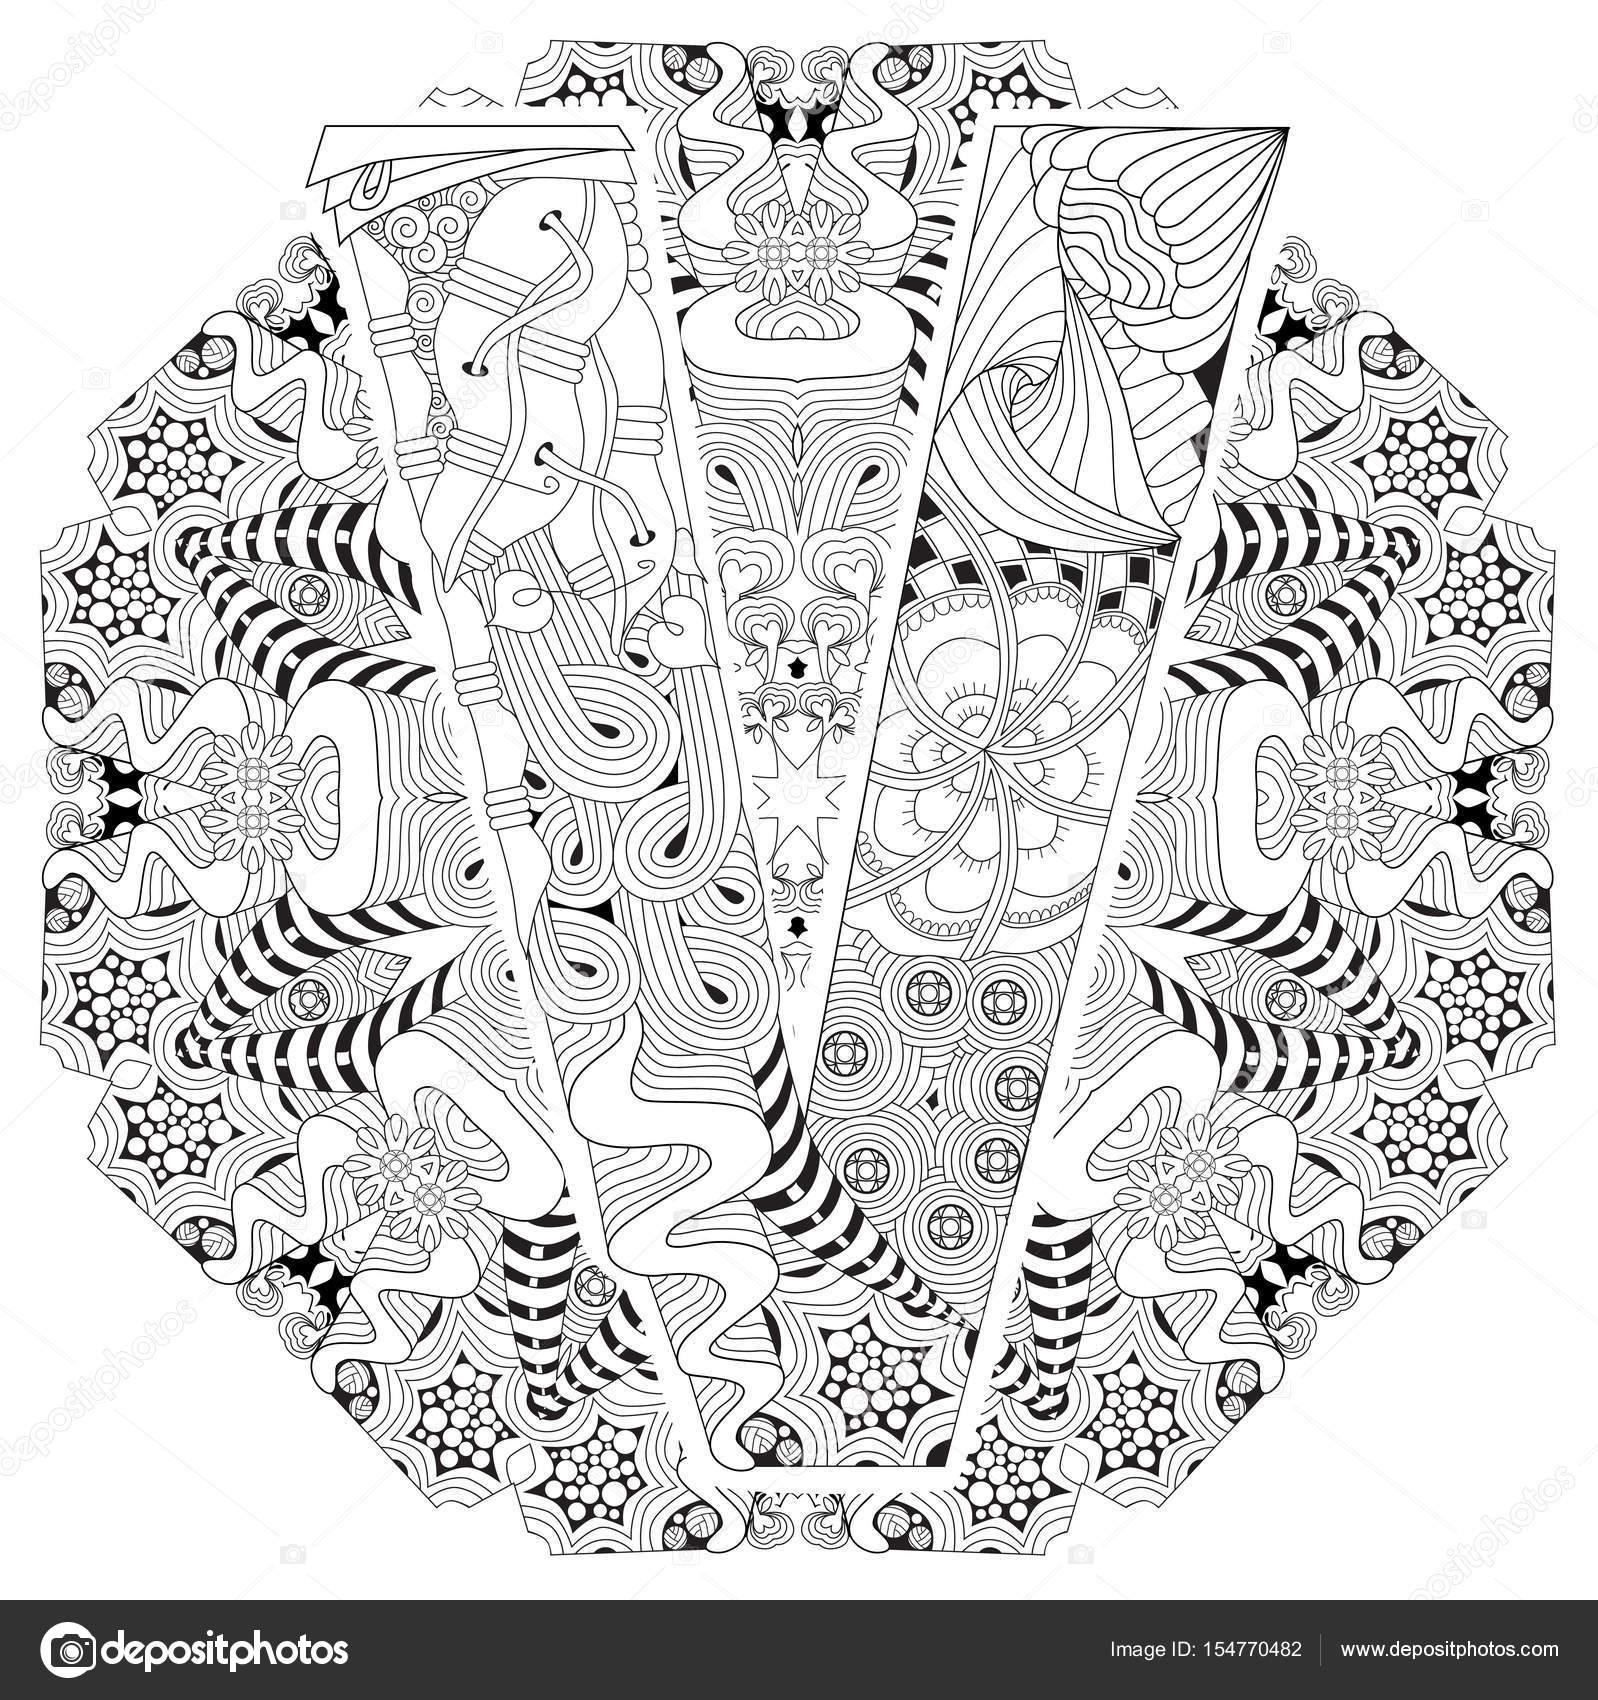 Fotos Letra V Mandala Mandala Con La Letra V Para